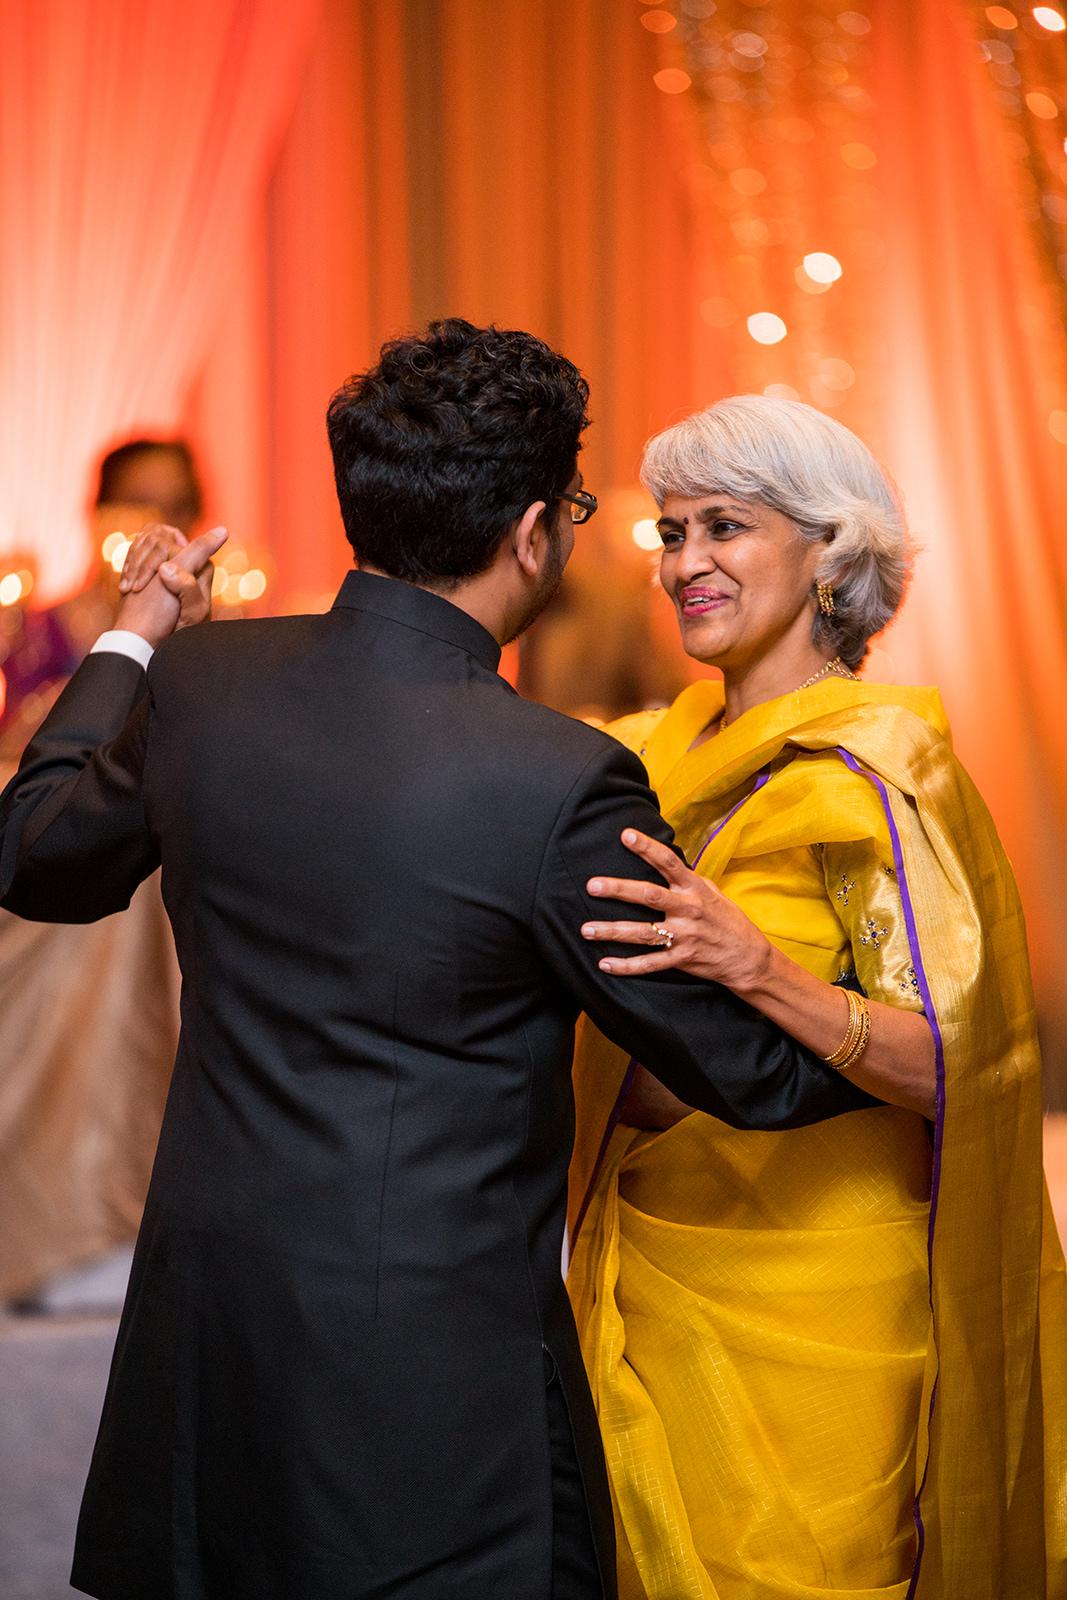 Le Cape Weddings - South Asian Wedding - Ishani and Sidhart - Wedding Reception-69.jpg